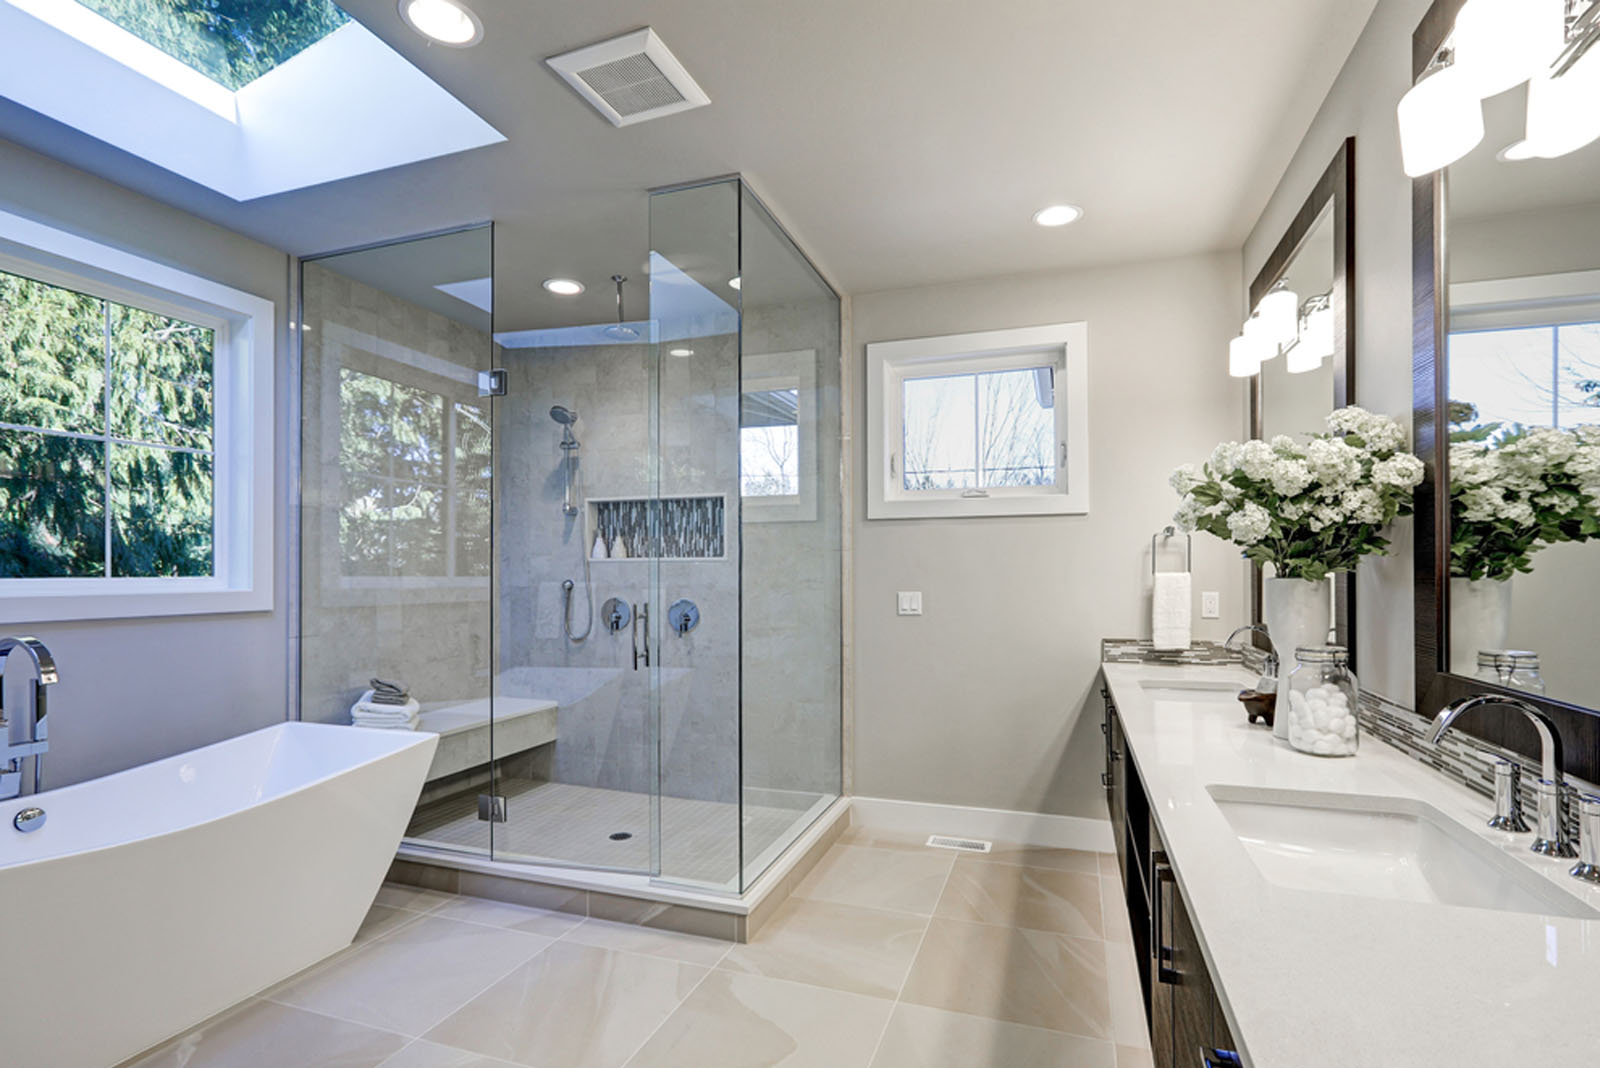 Bathroom design Kincir Bali WP 7